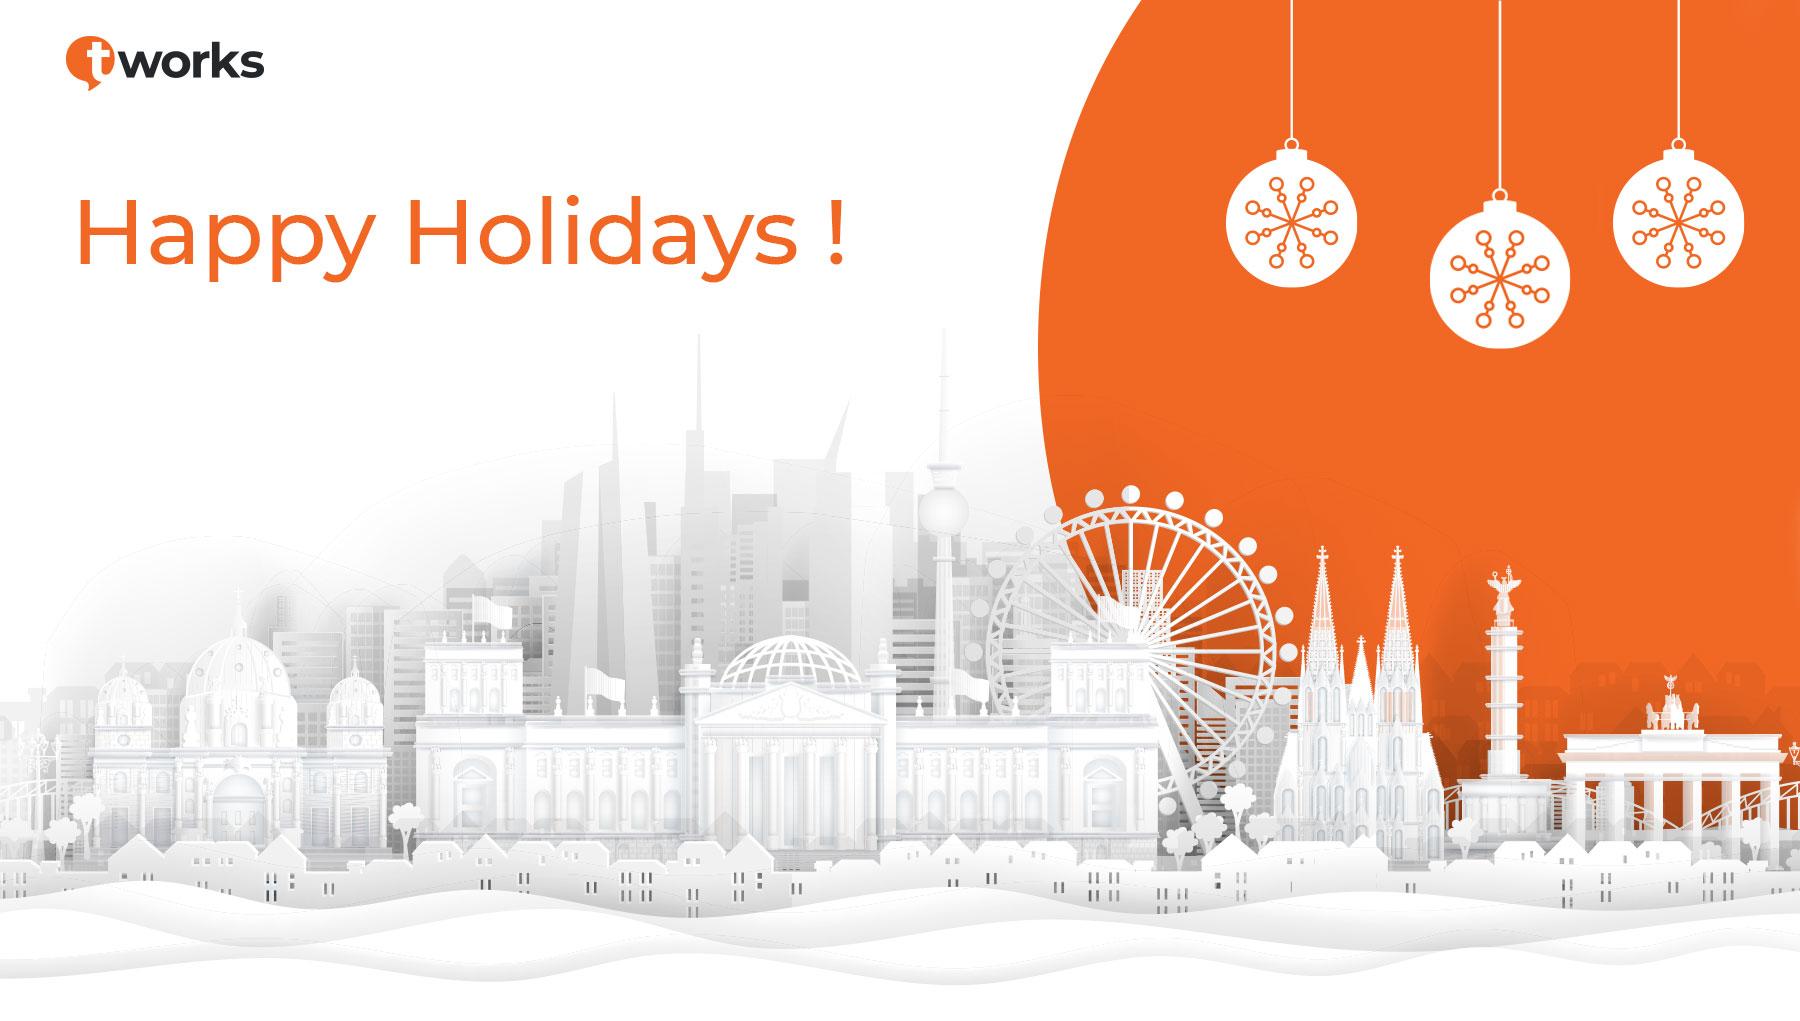 Happy Holiday Season at t'works translations